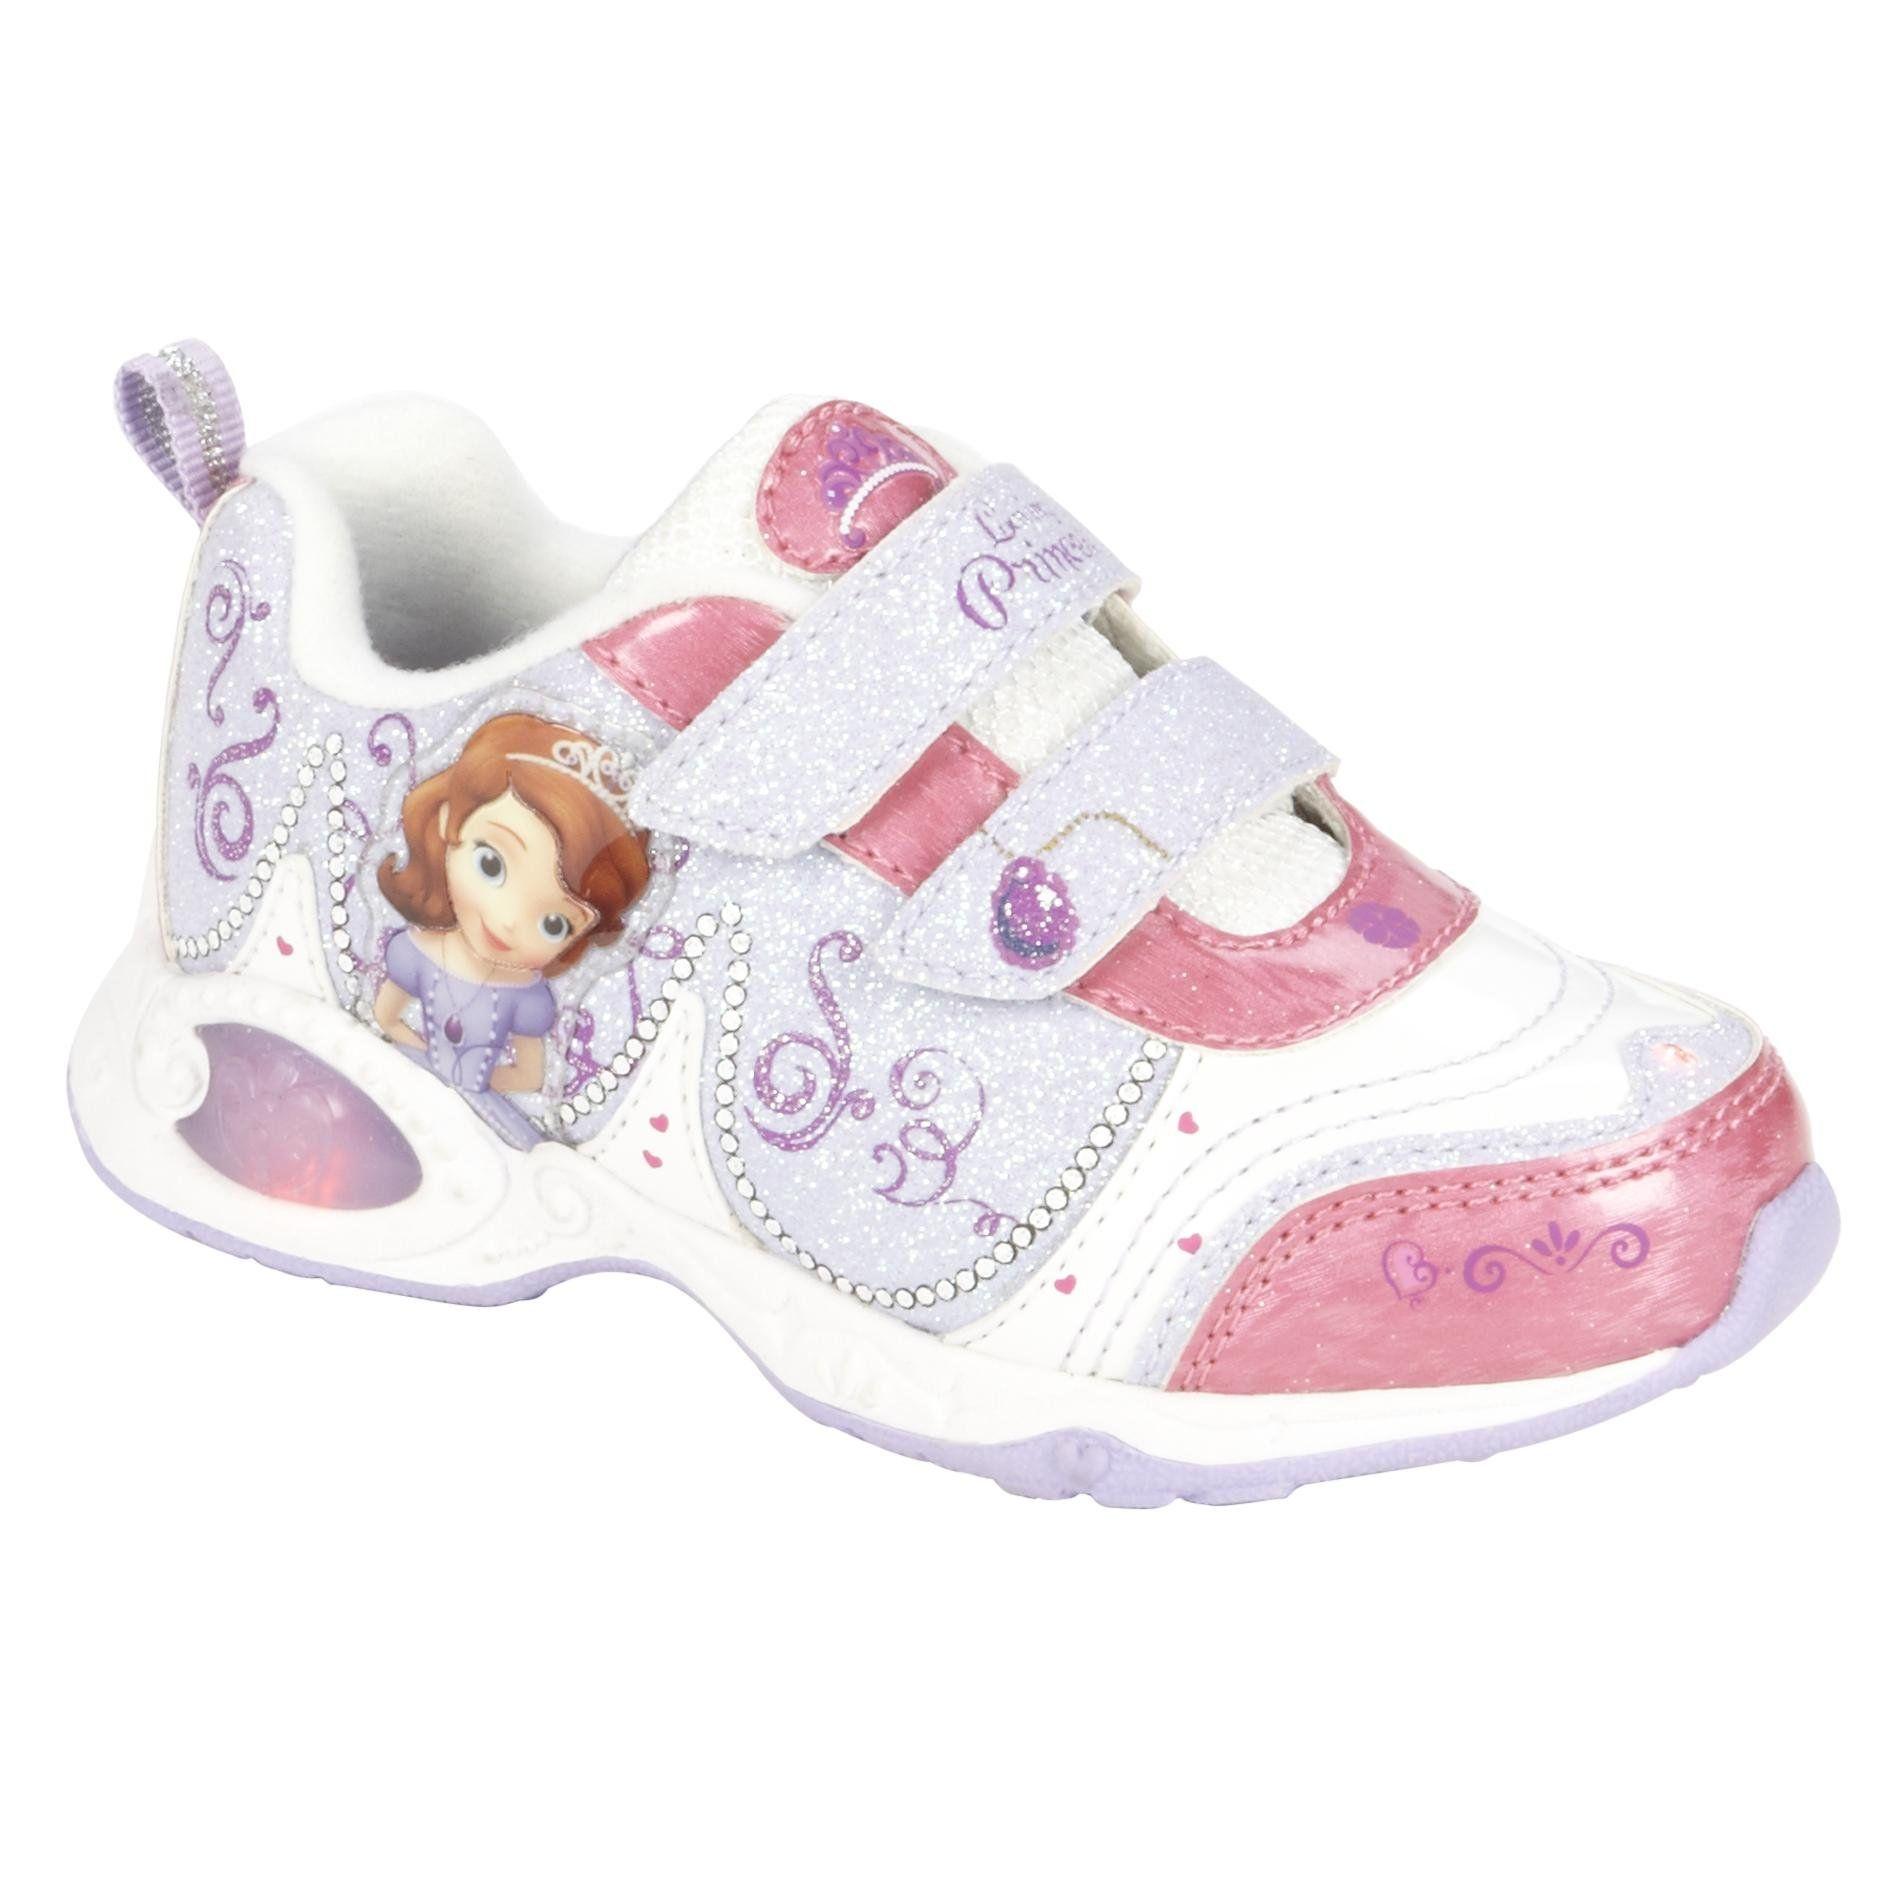 Disney Sofia the First Toddler Girl s White Sneaker